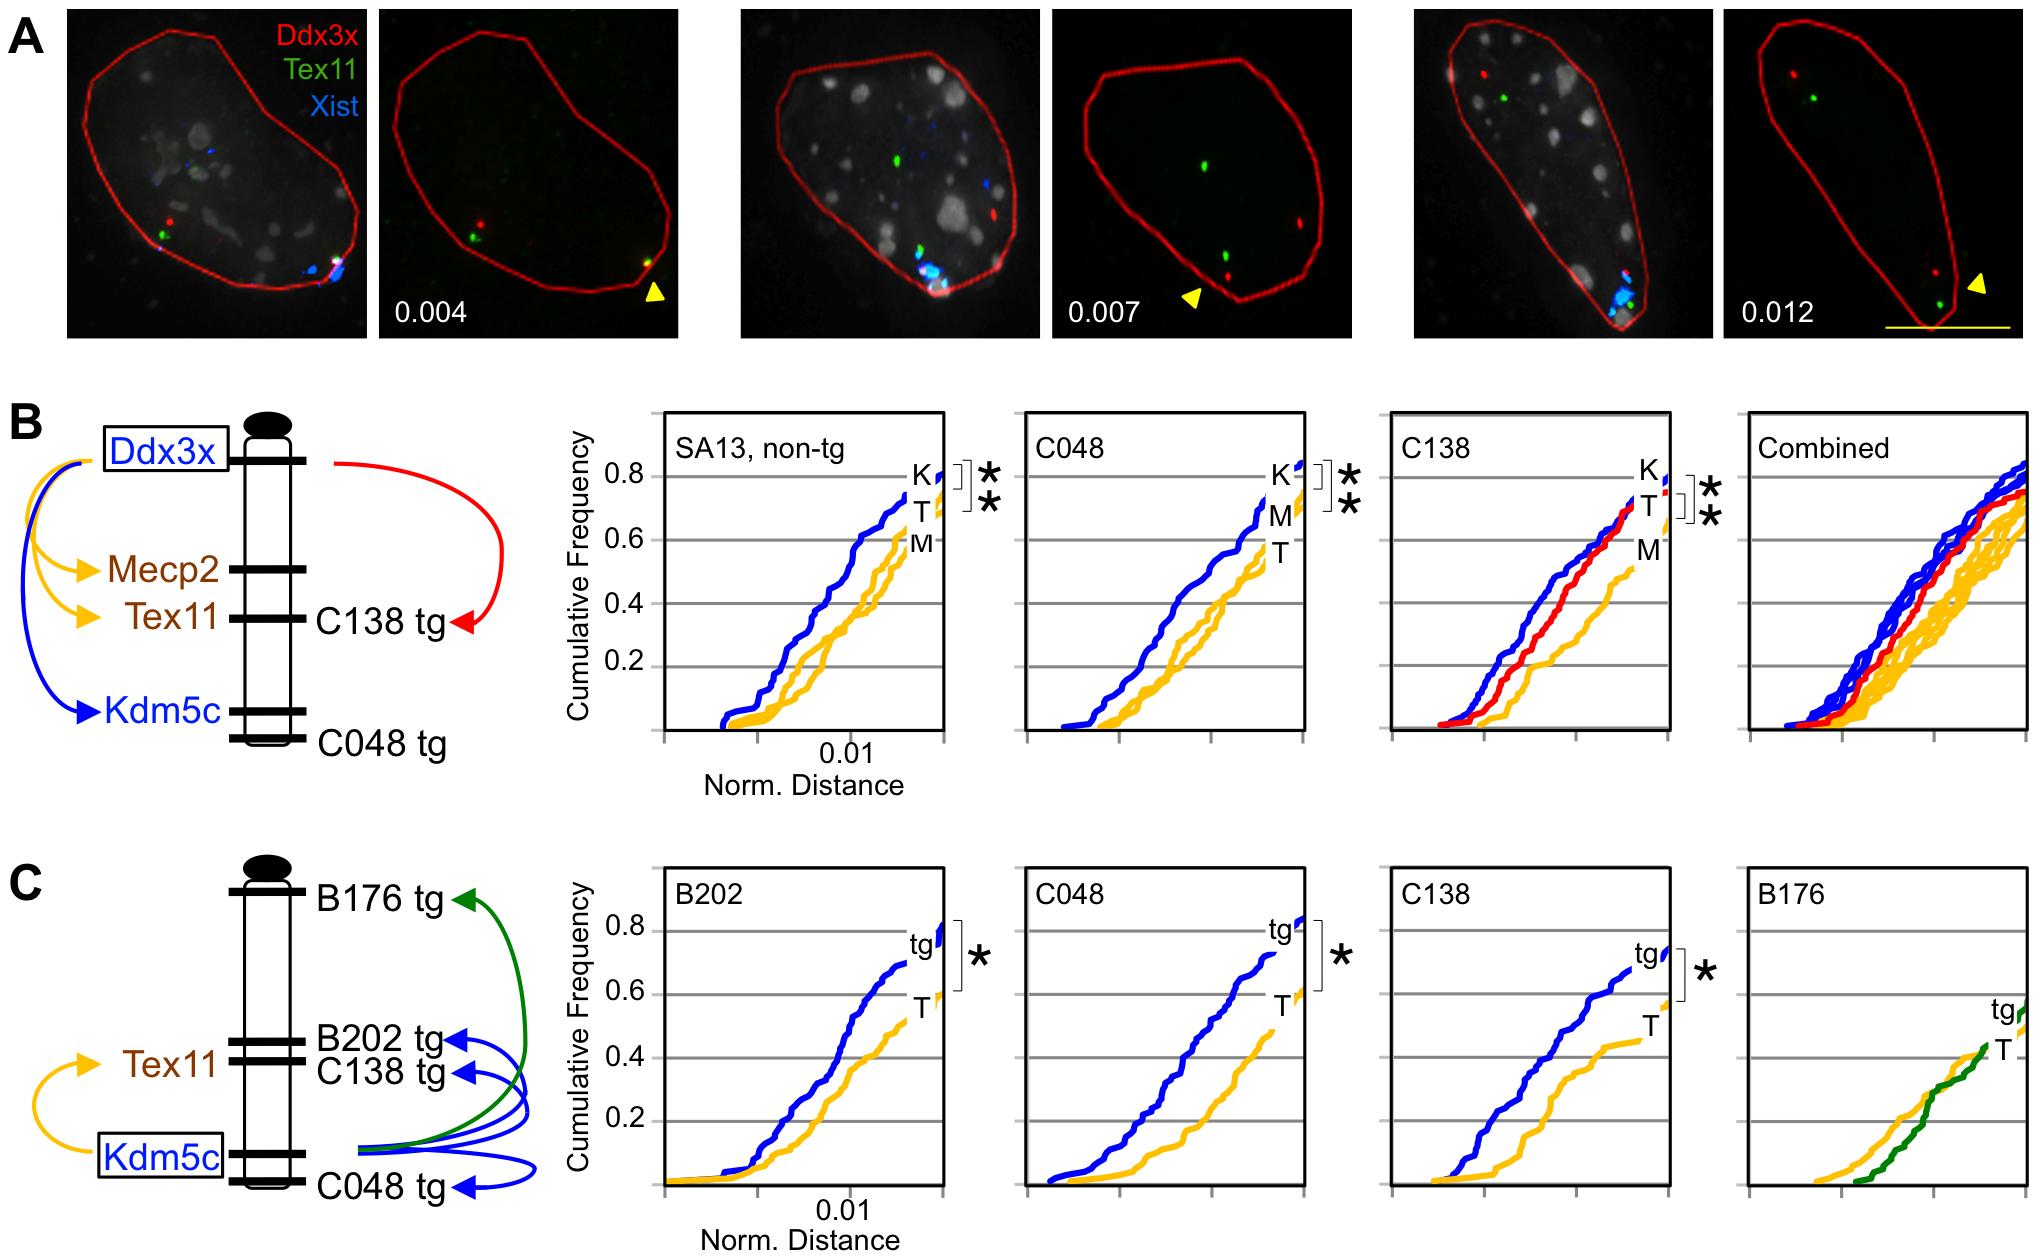 Transgenes assume frequent long-range escape-gene interactions.